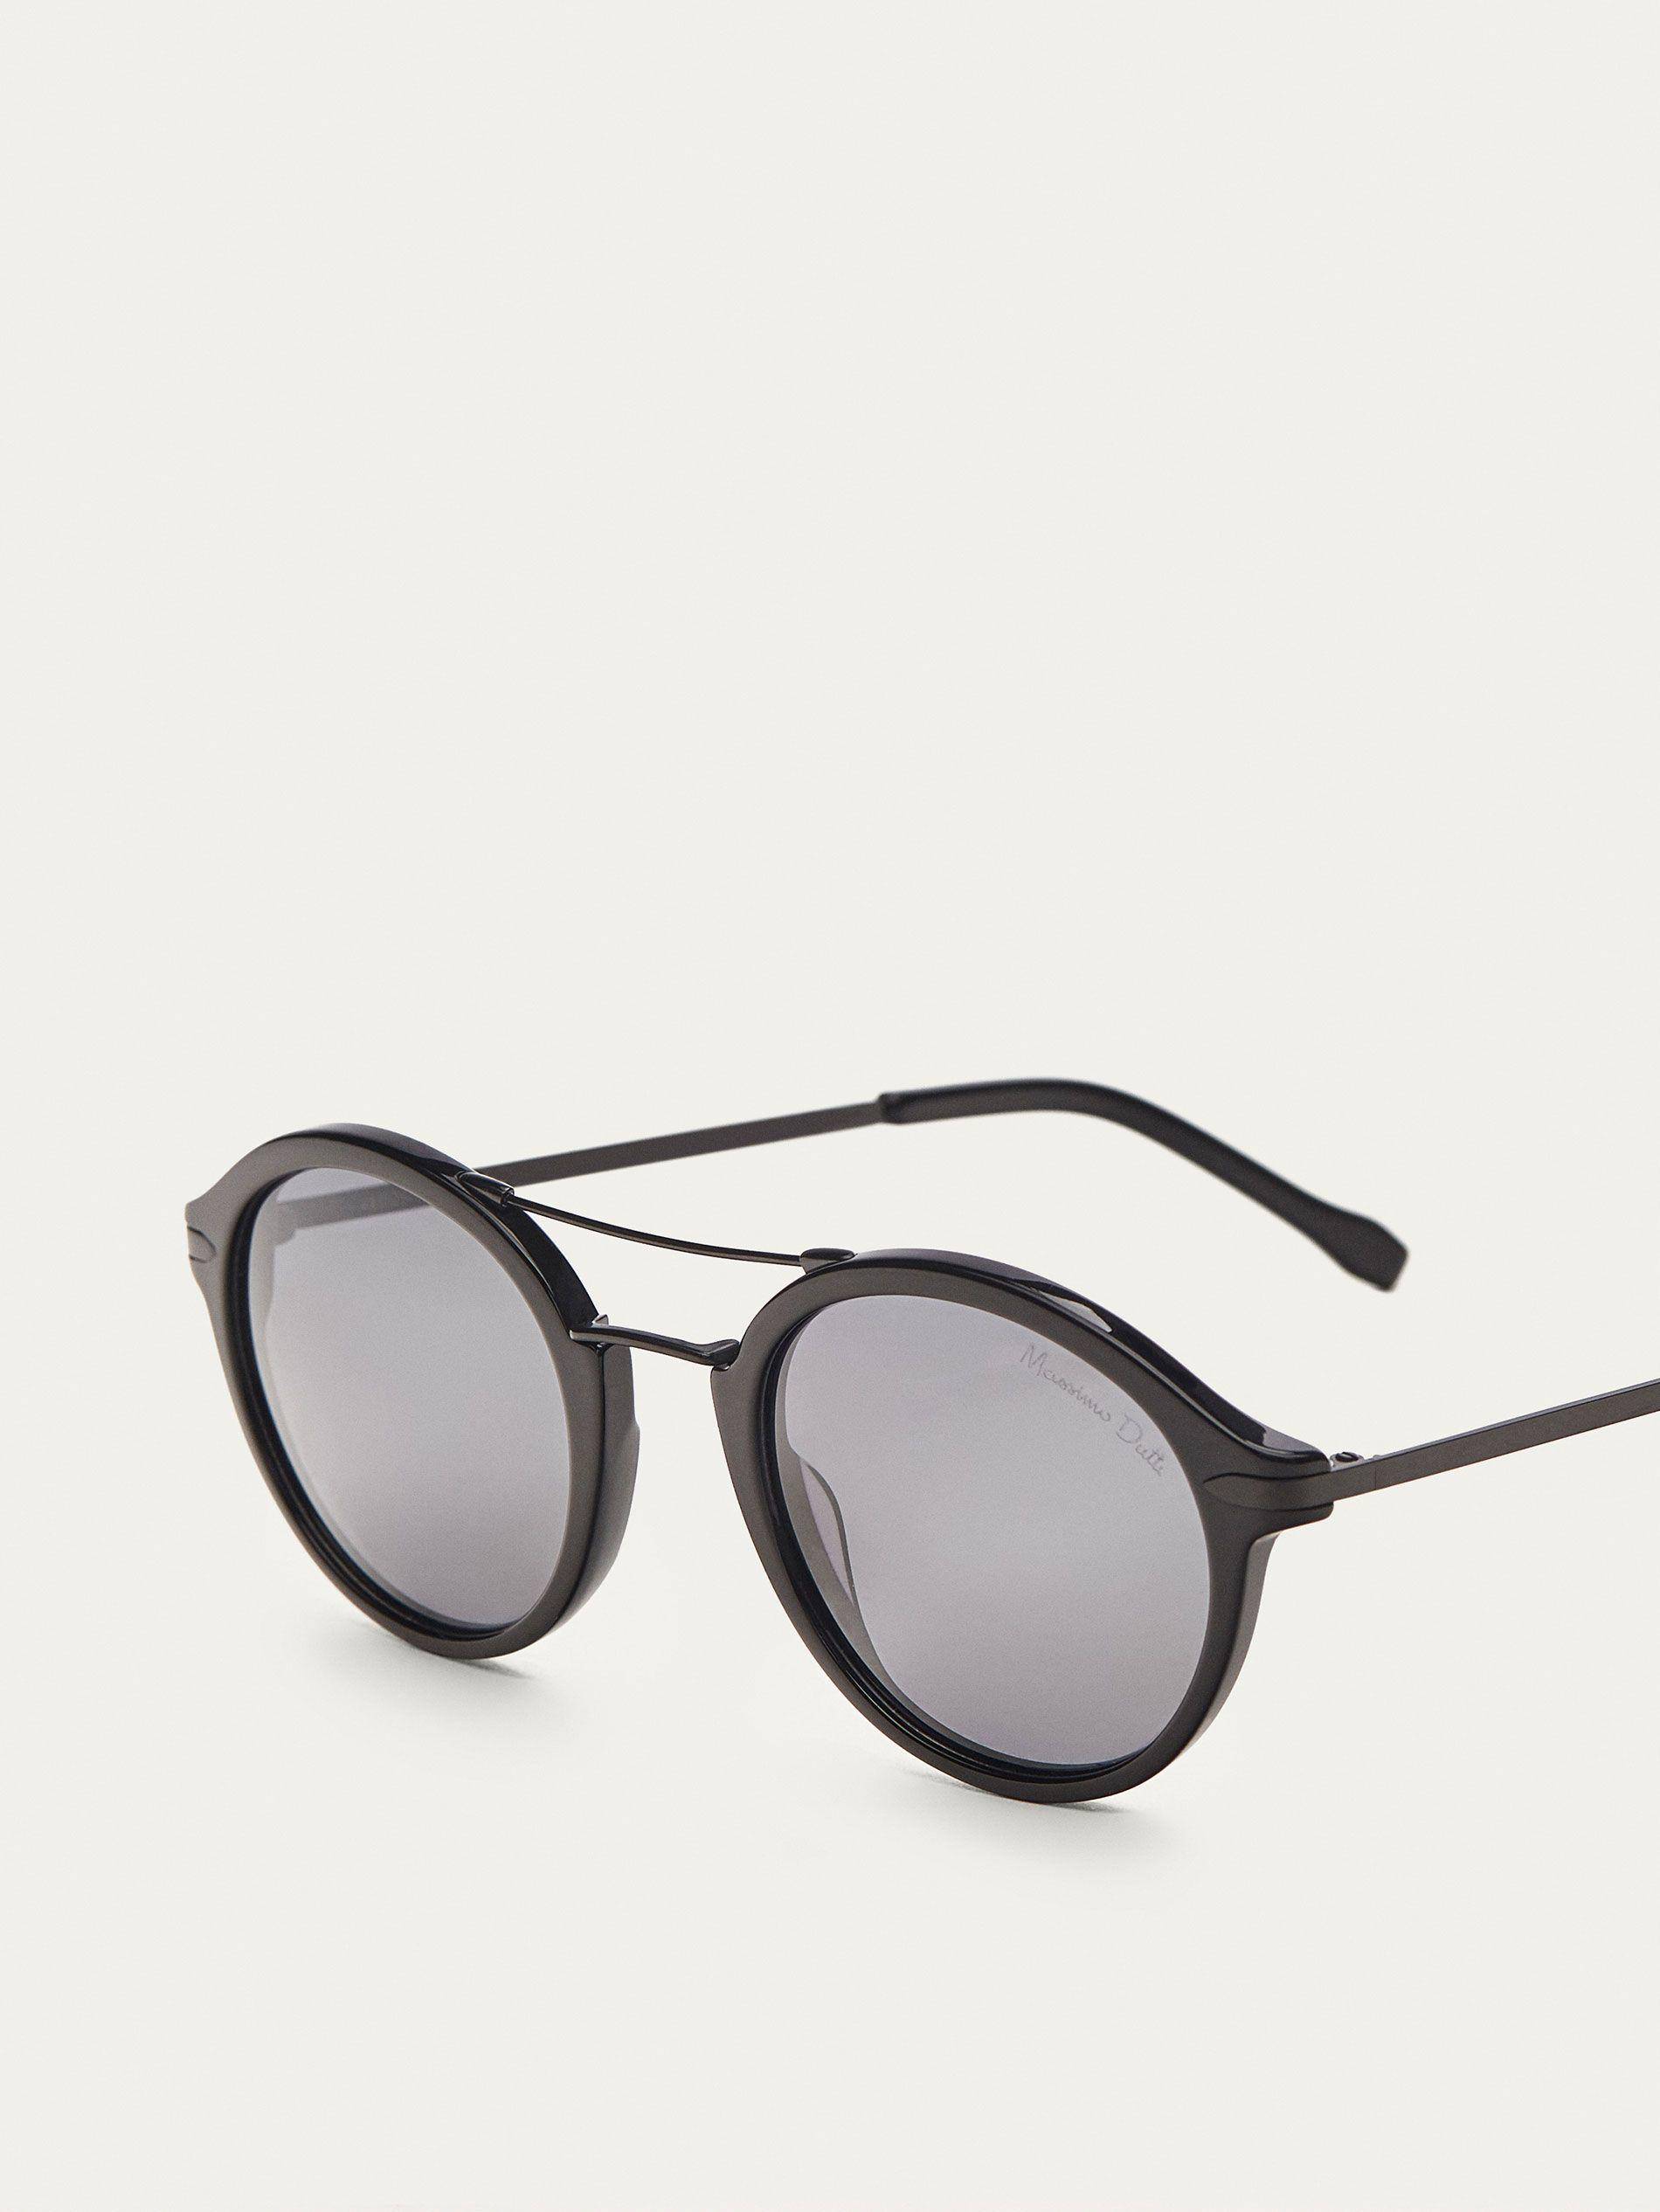 729d4c79af311 Watches   Sunglasses - Accessories - MEN - Massimo Dutti